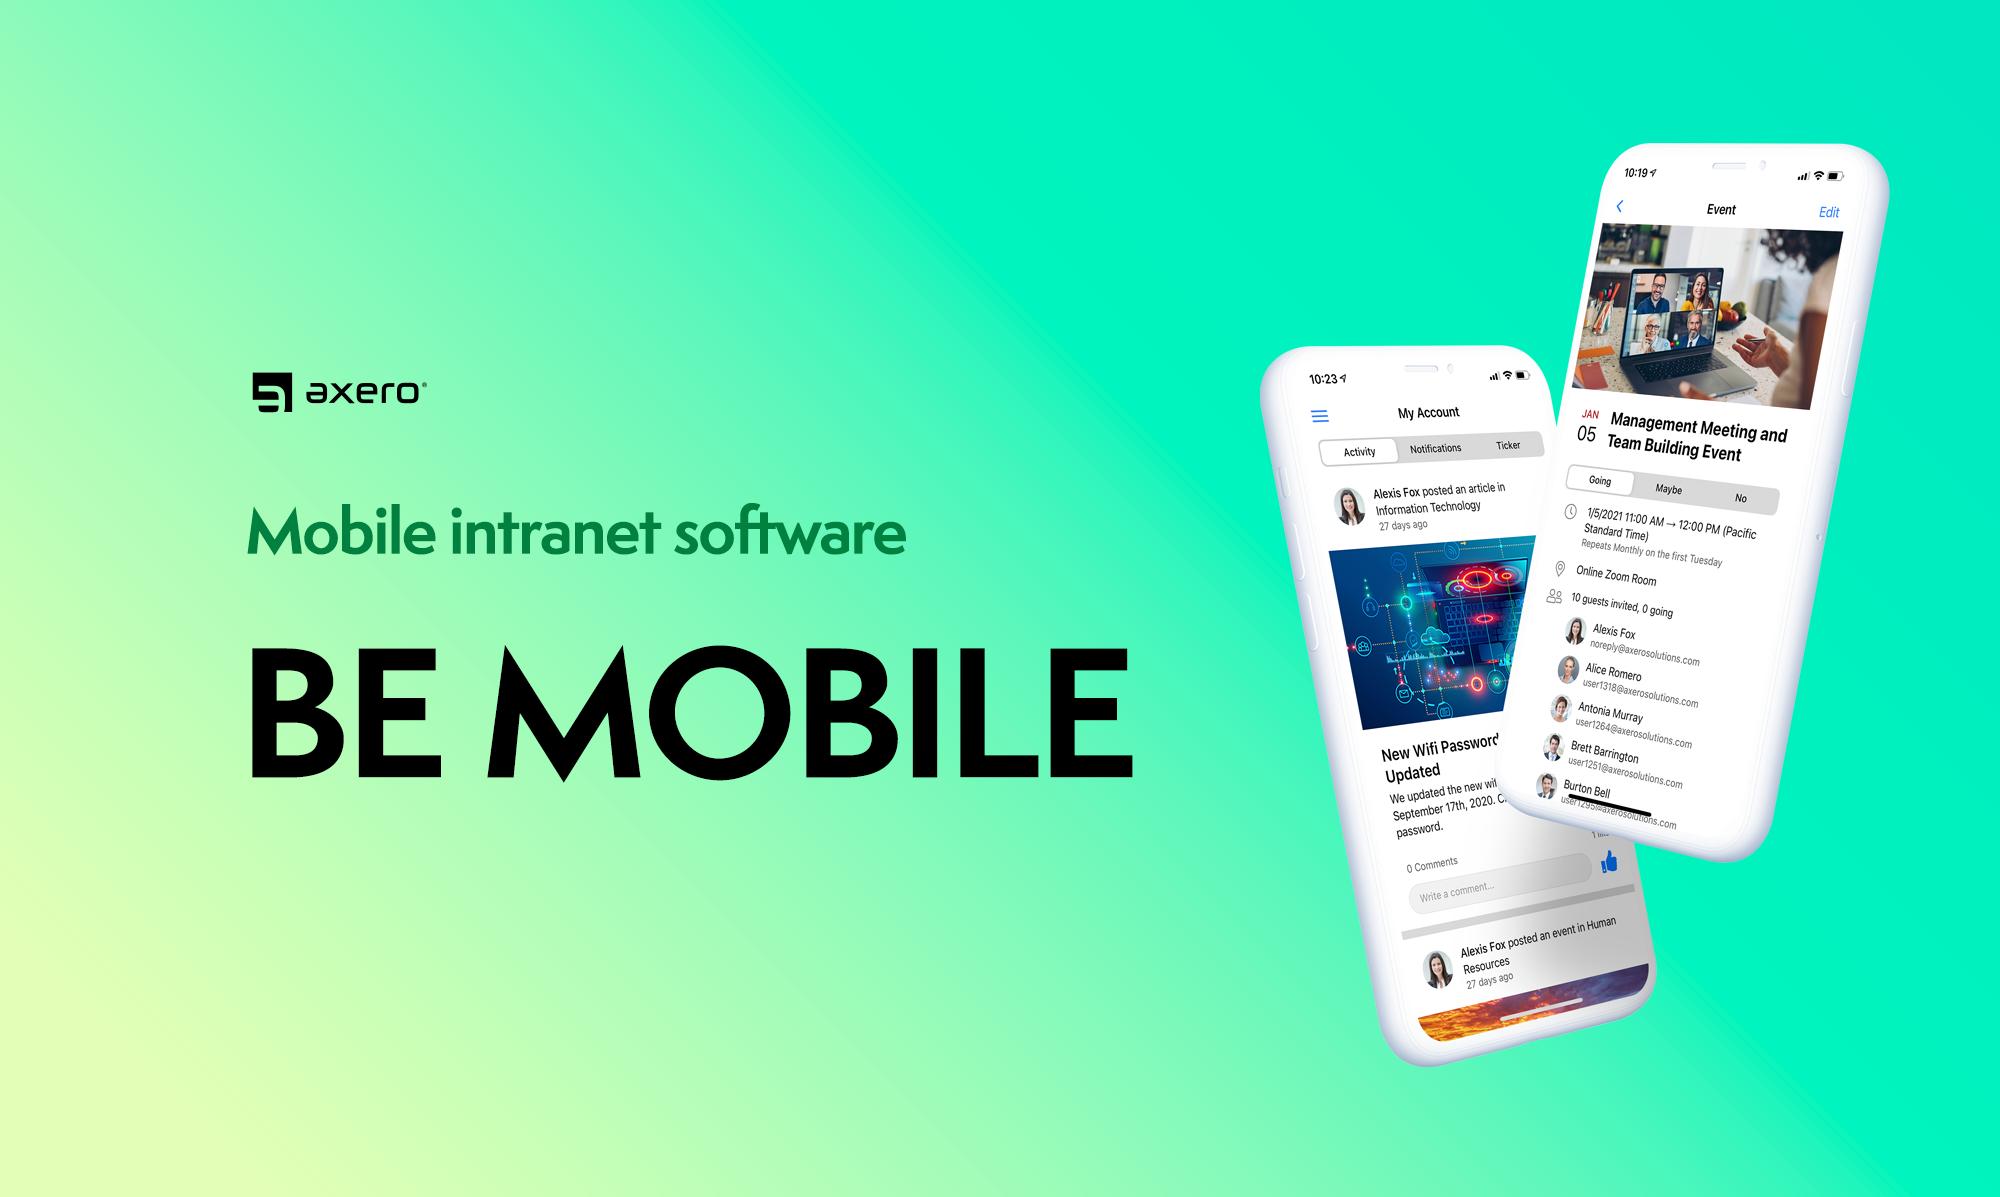 Best Mobile Intranet App for Employee Communication